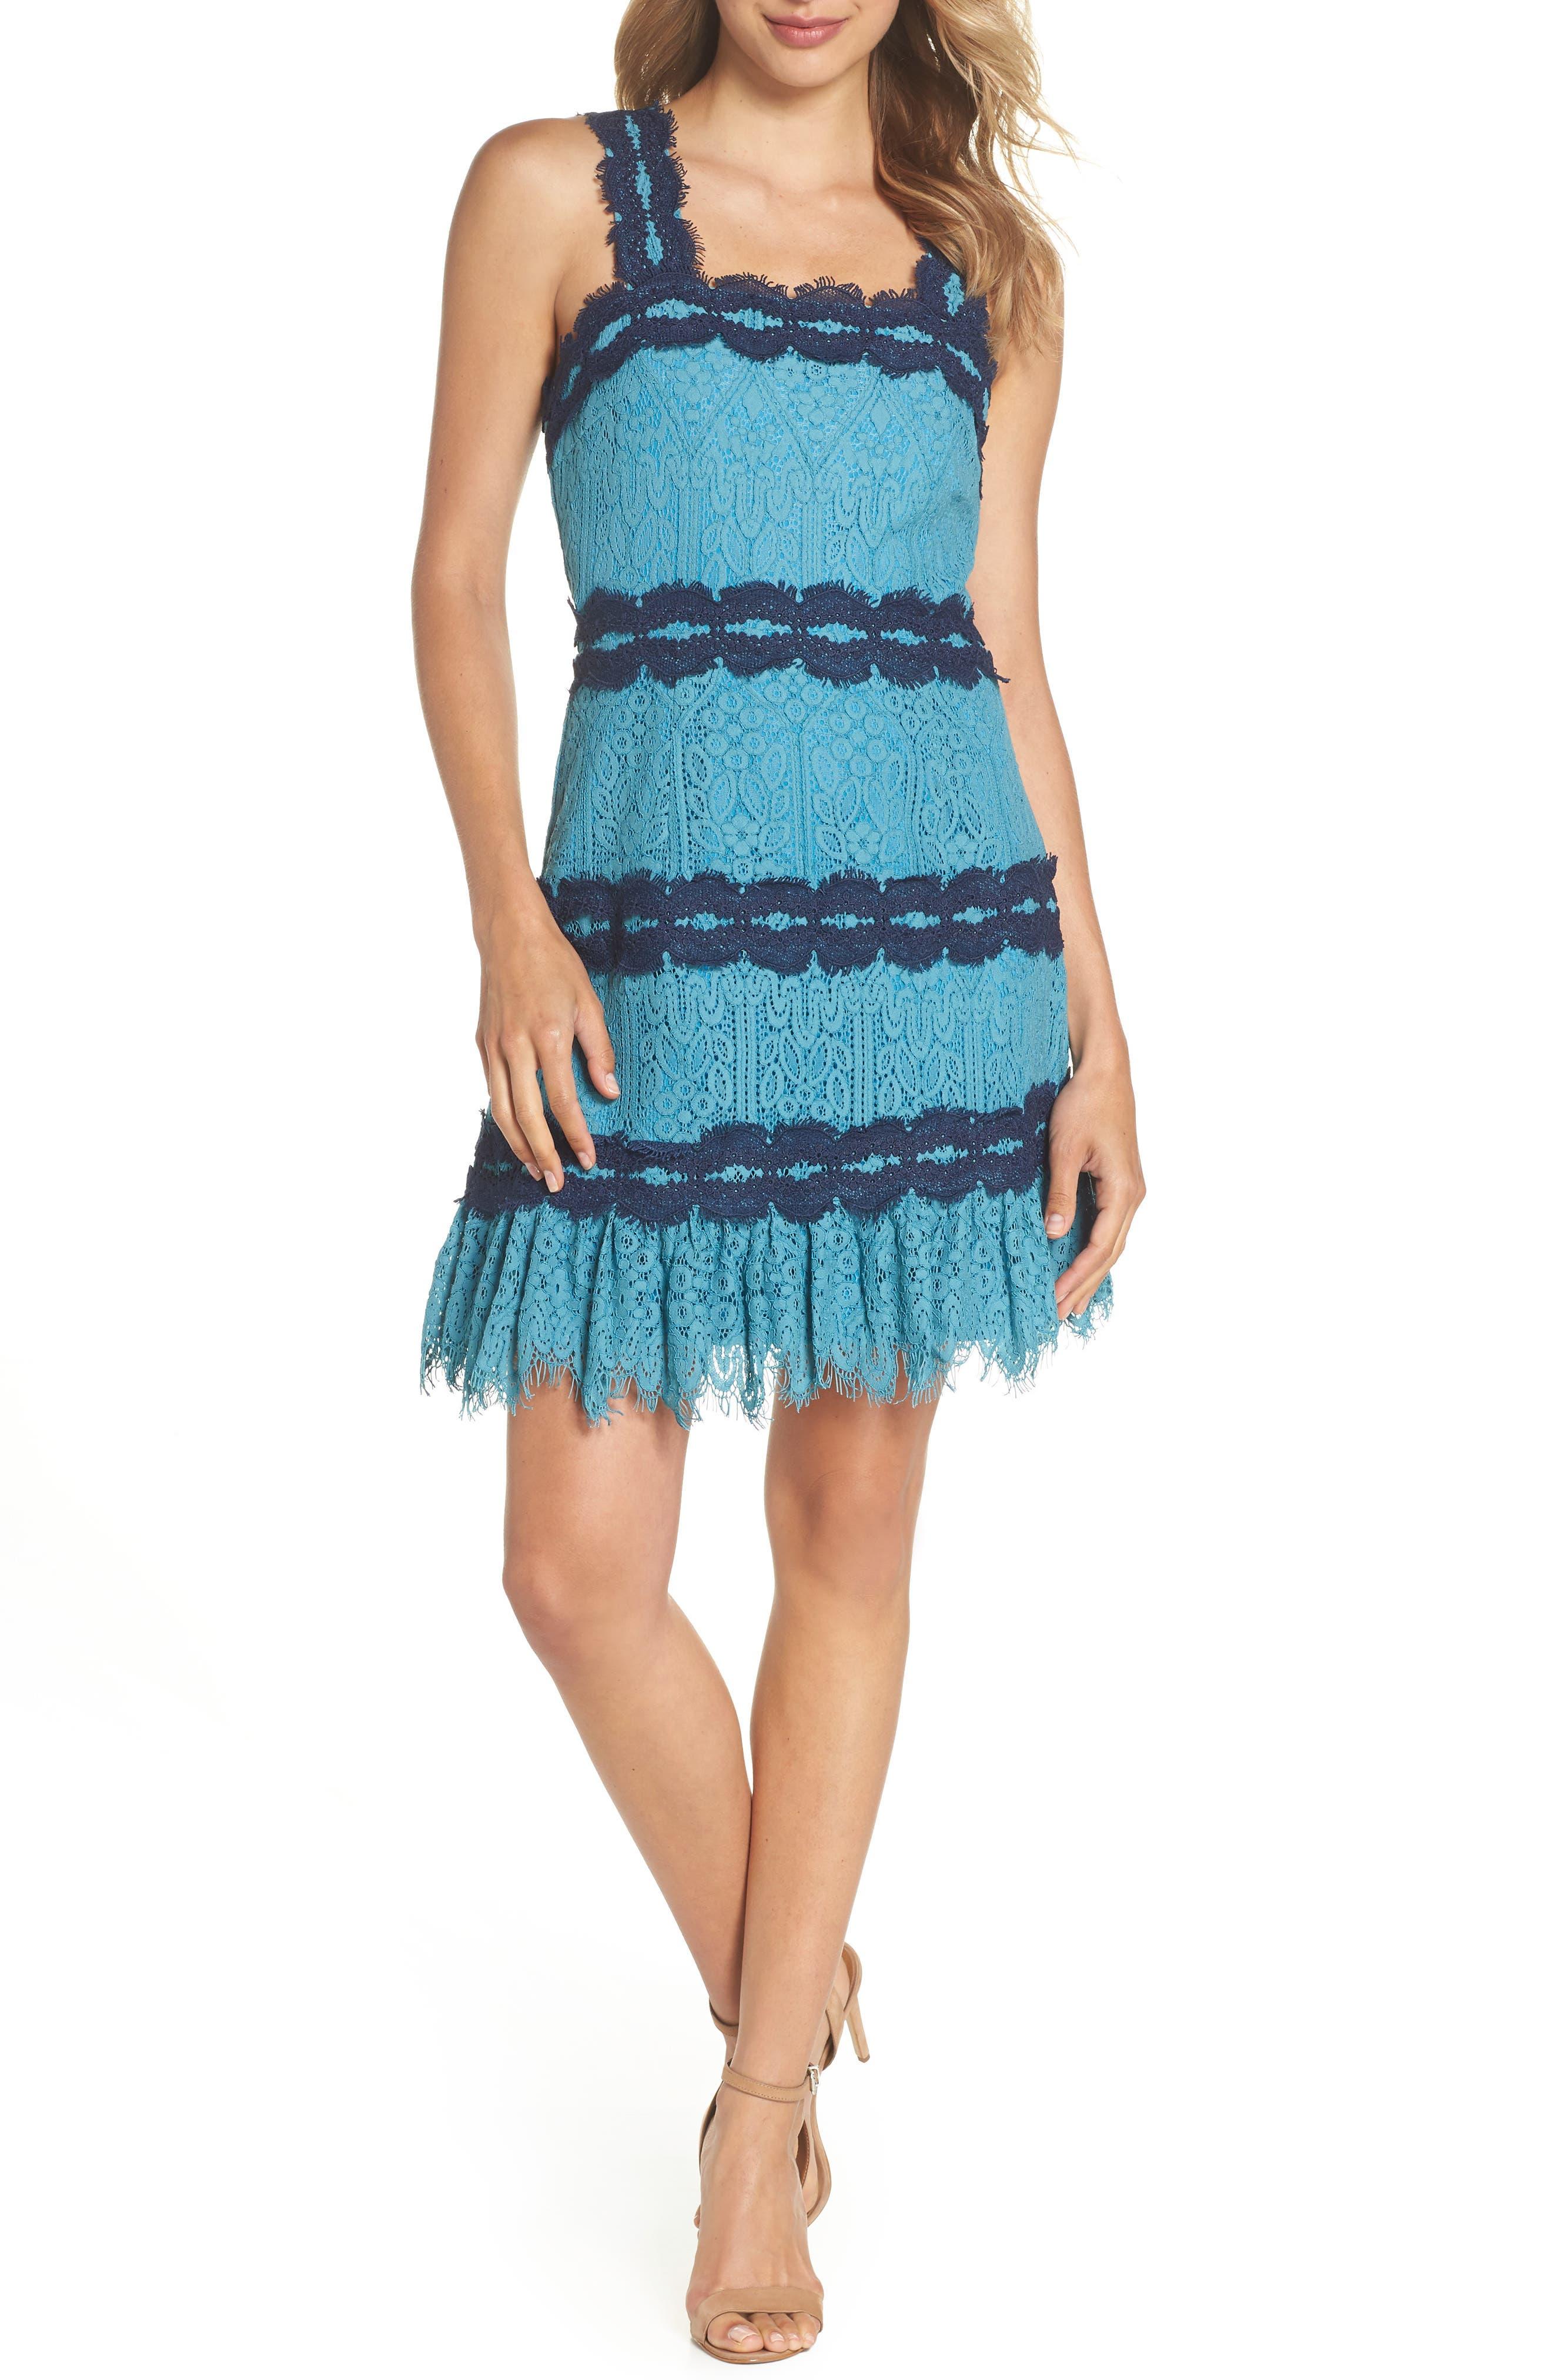 Lula Ruffle Lace Dress,                             Main thumbnail 1, color,                             TEAL/ NAVY